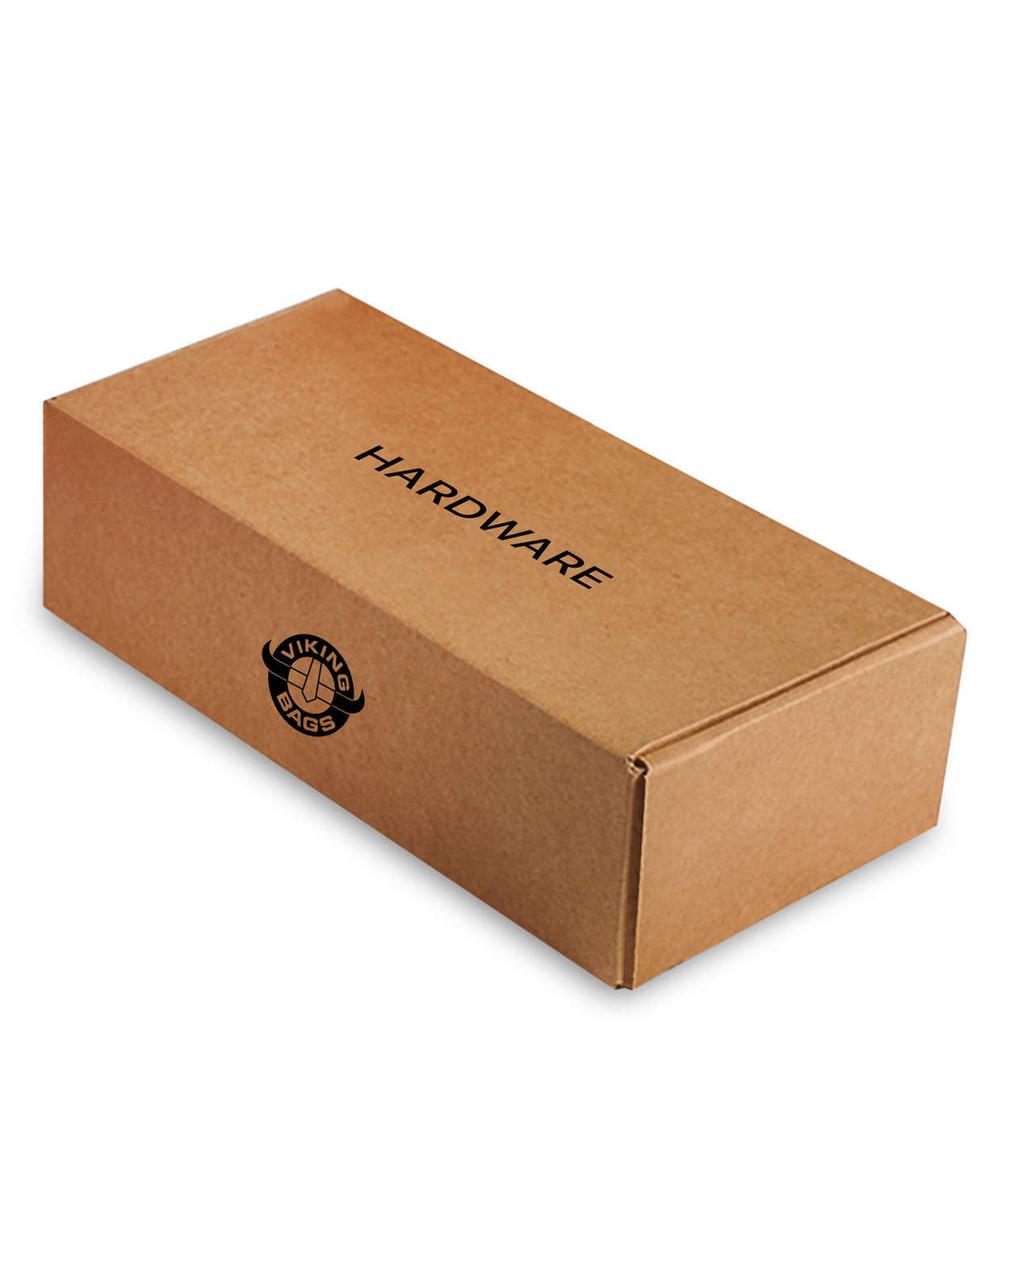 Honda 1500 Valkyrie Interstate Charger Single Strap Studded Motorcycle Saddlebags Hardware Box